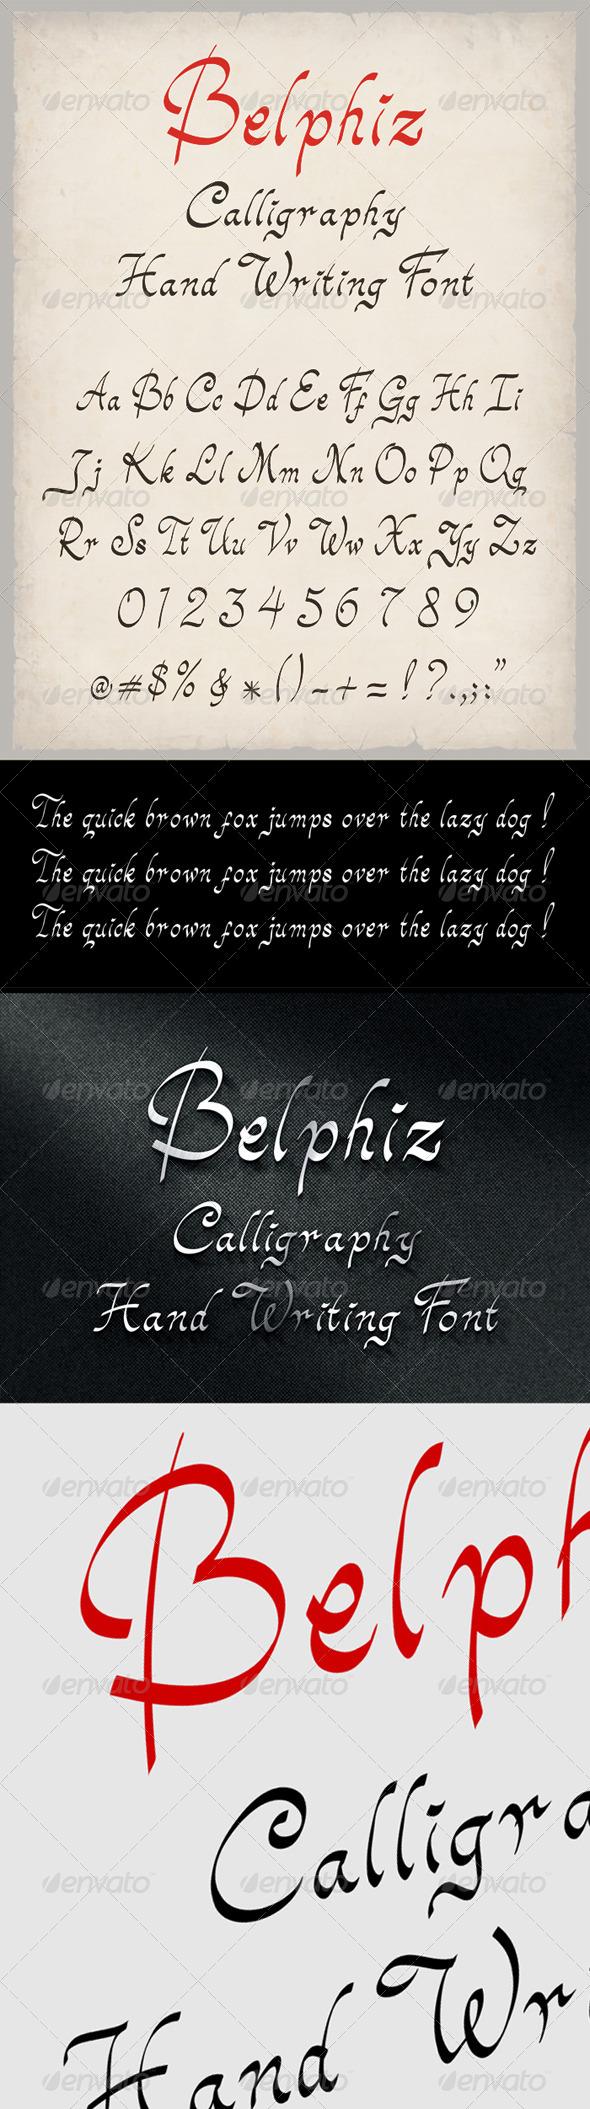 GraphicRiver Belphiz Font 7053490